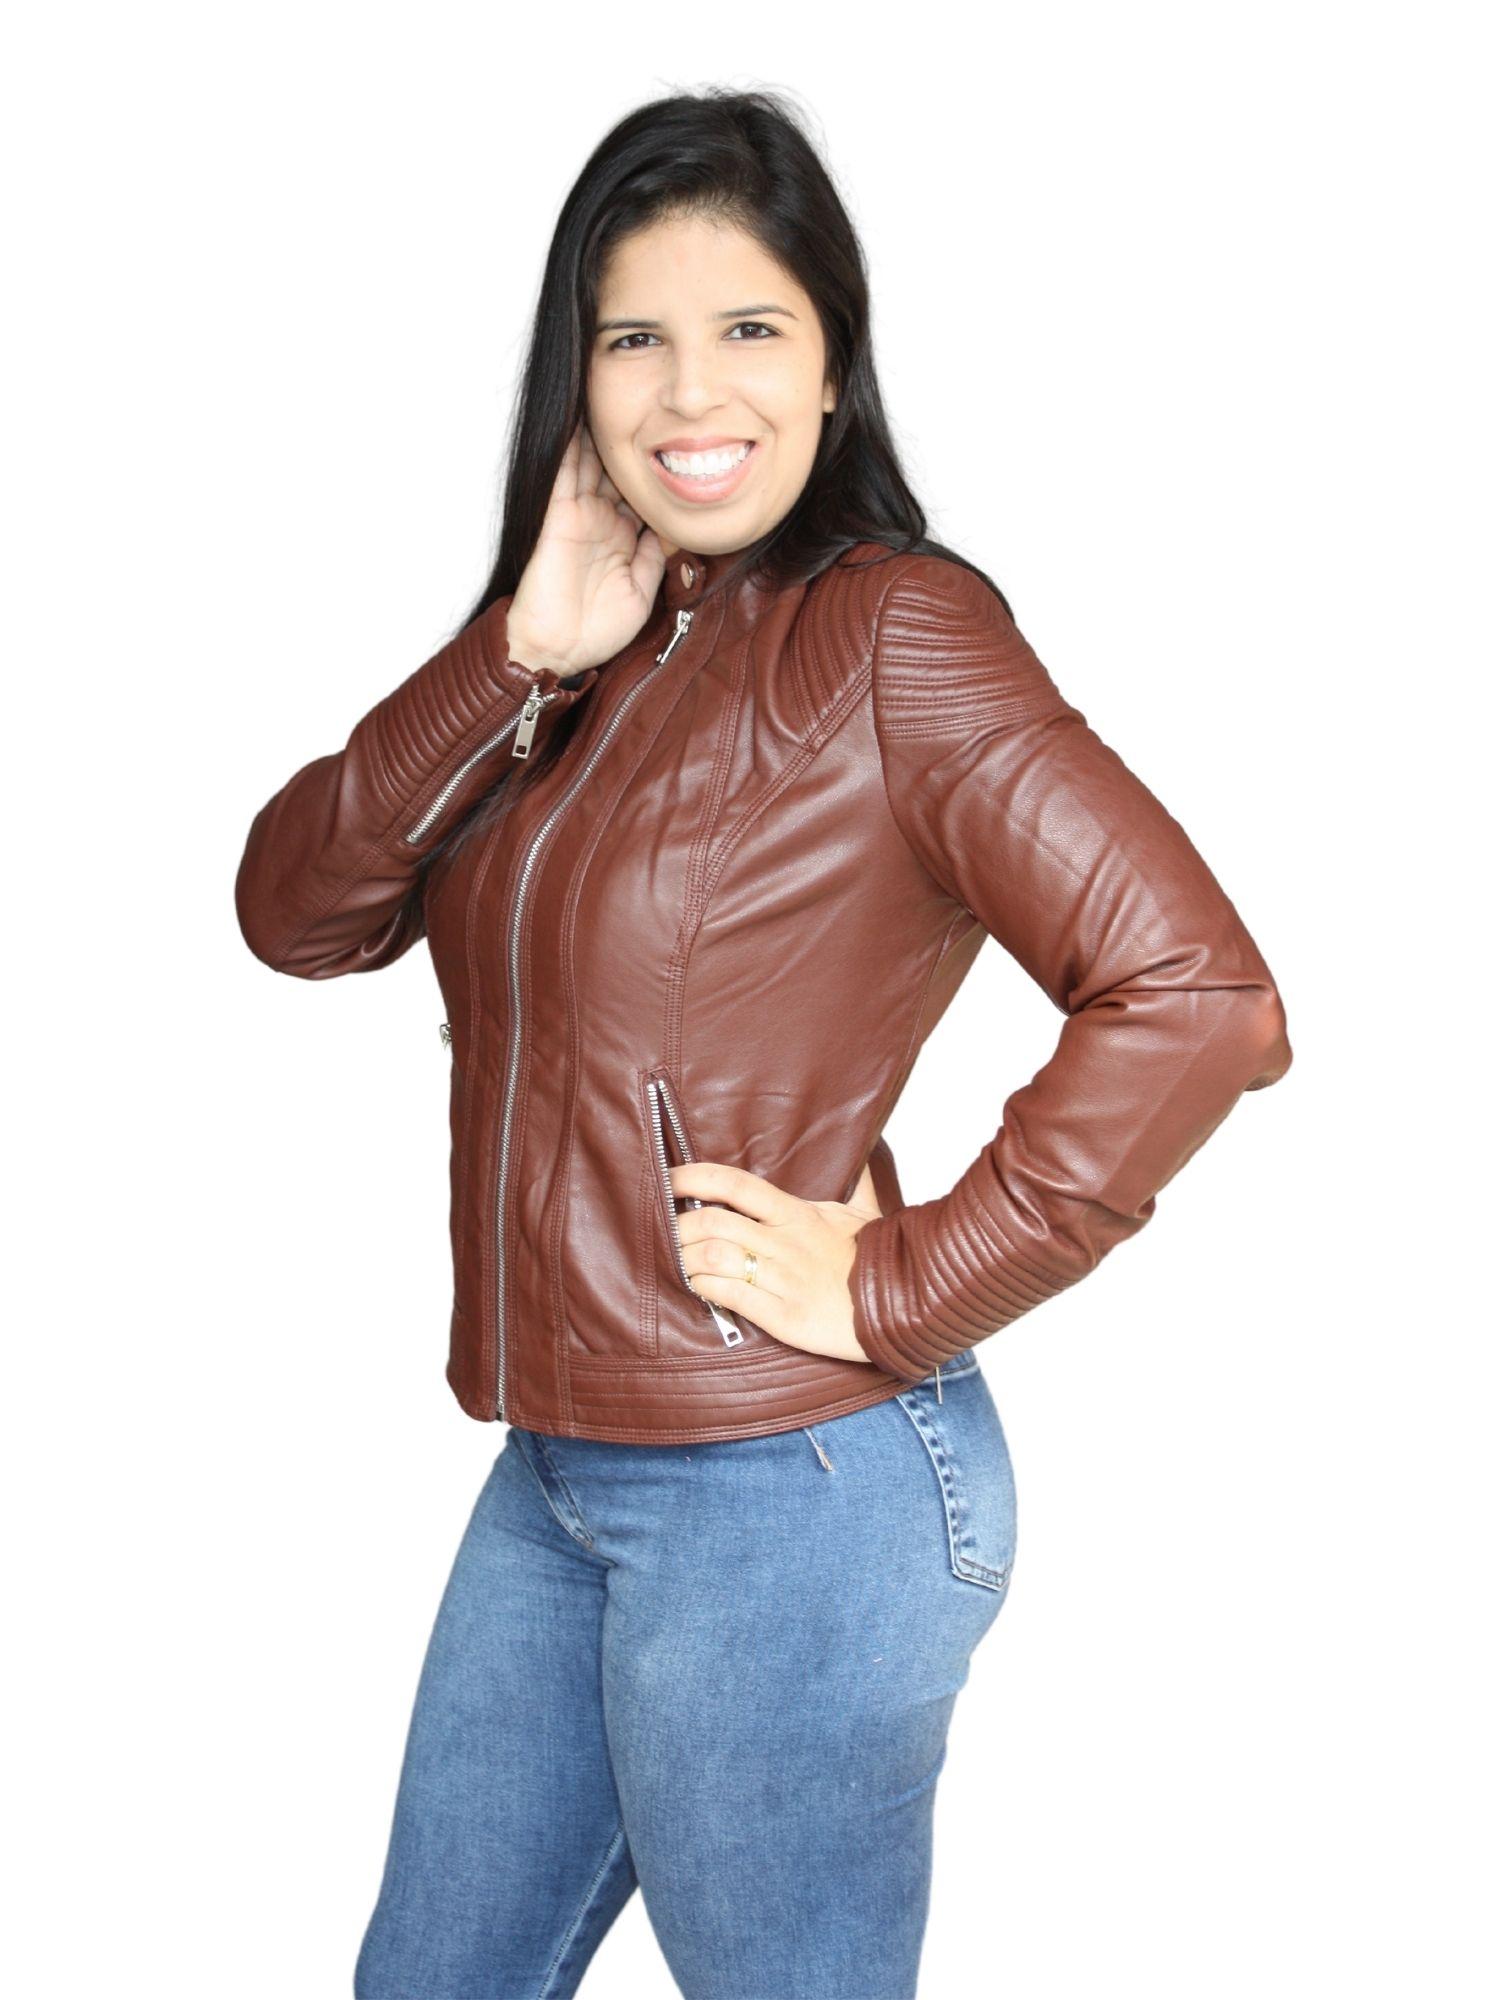 Jaqueta Feminina Courino Cinturada Facinelli  640406